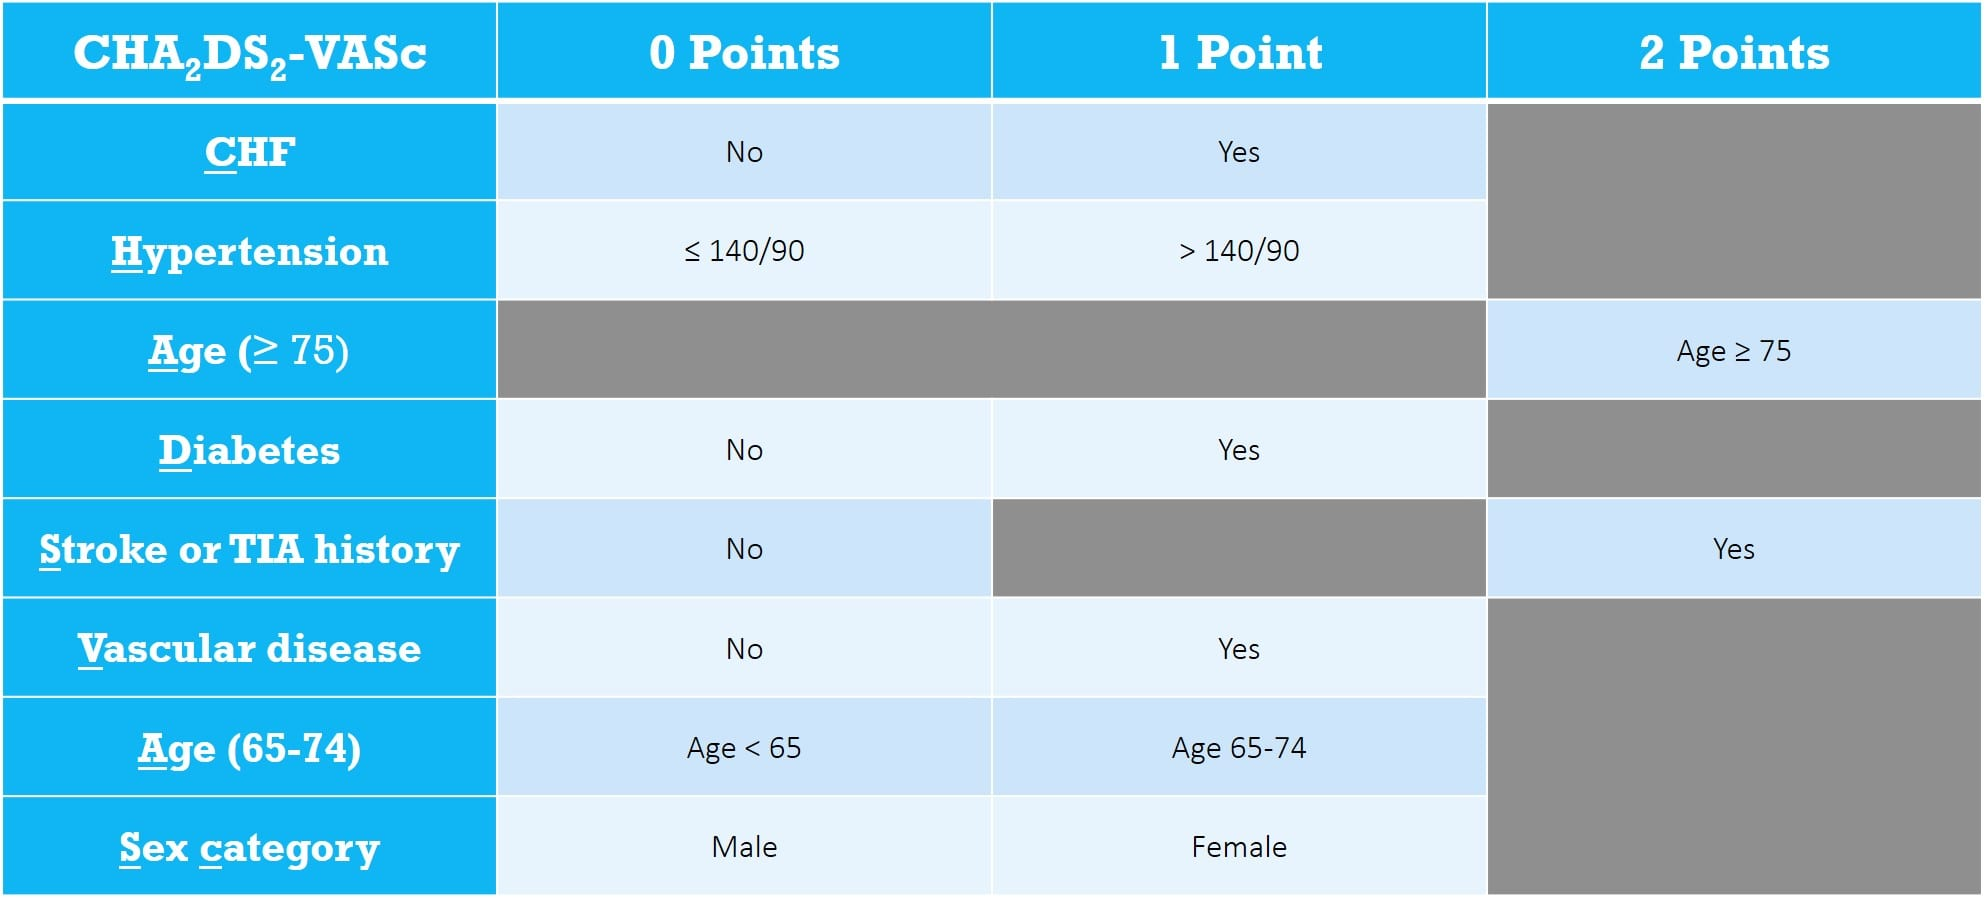 CHA2DS2VASC Score Table